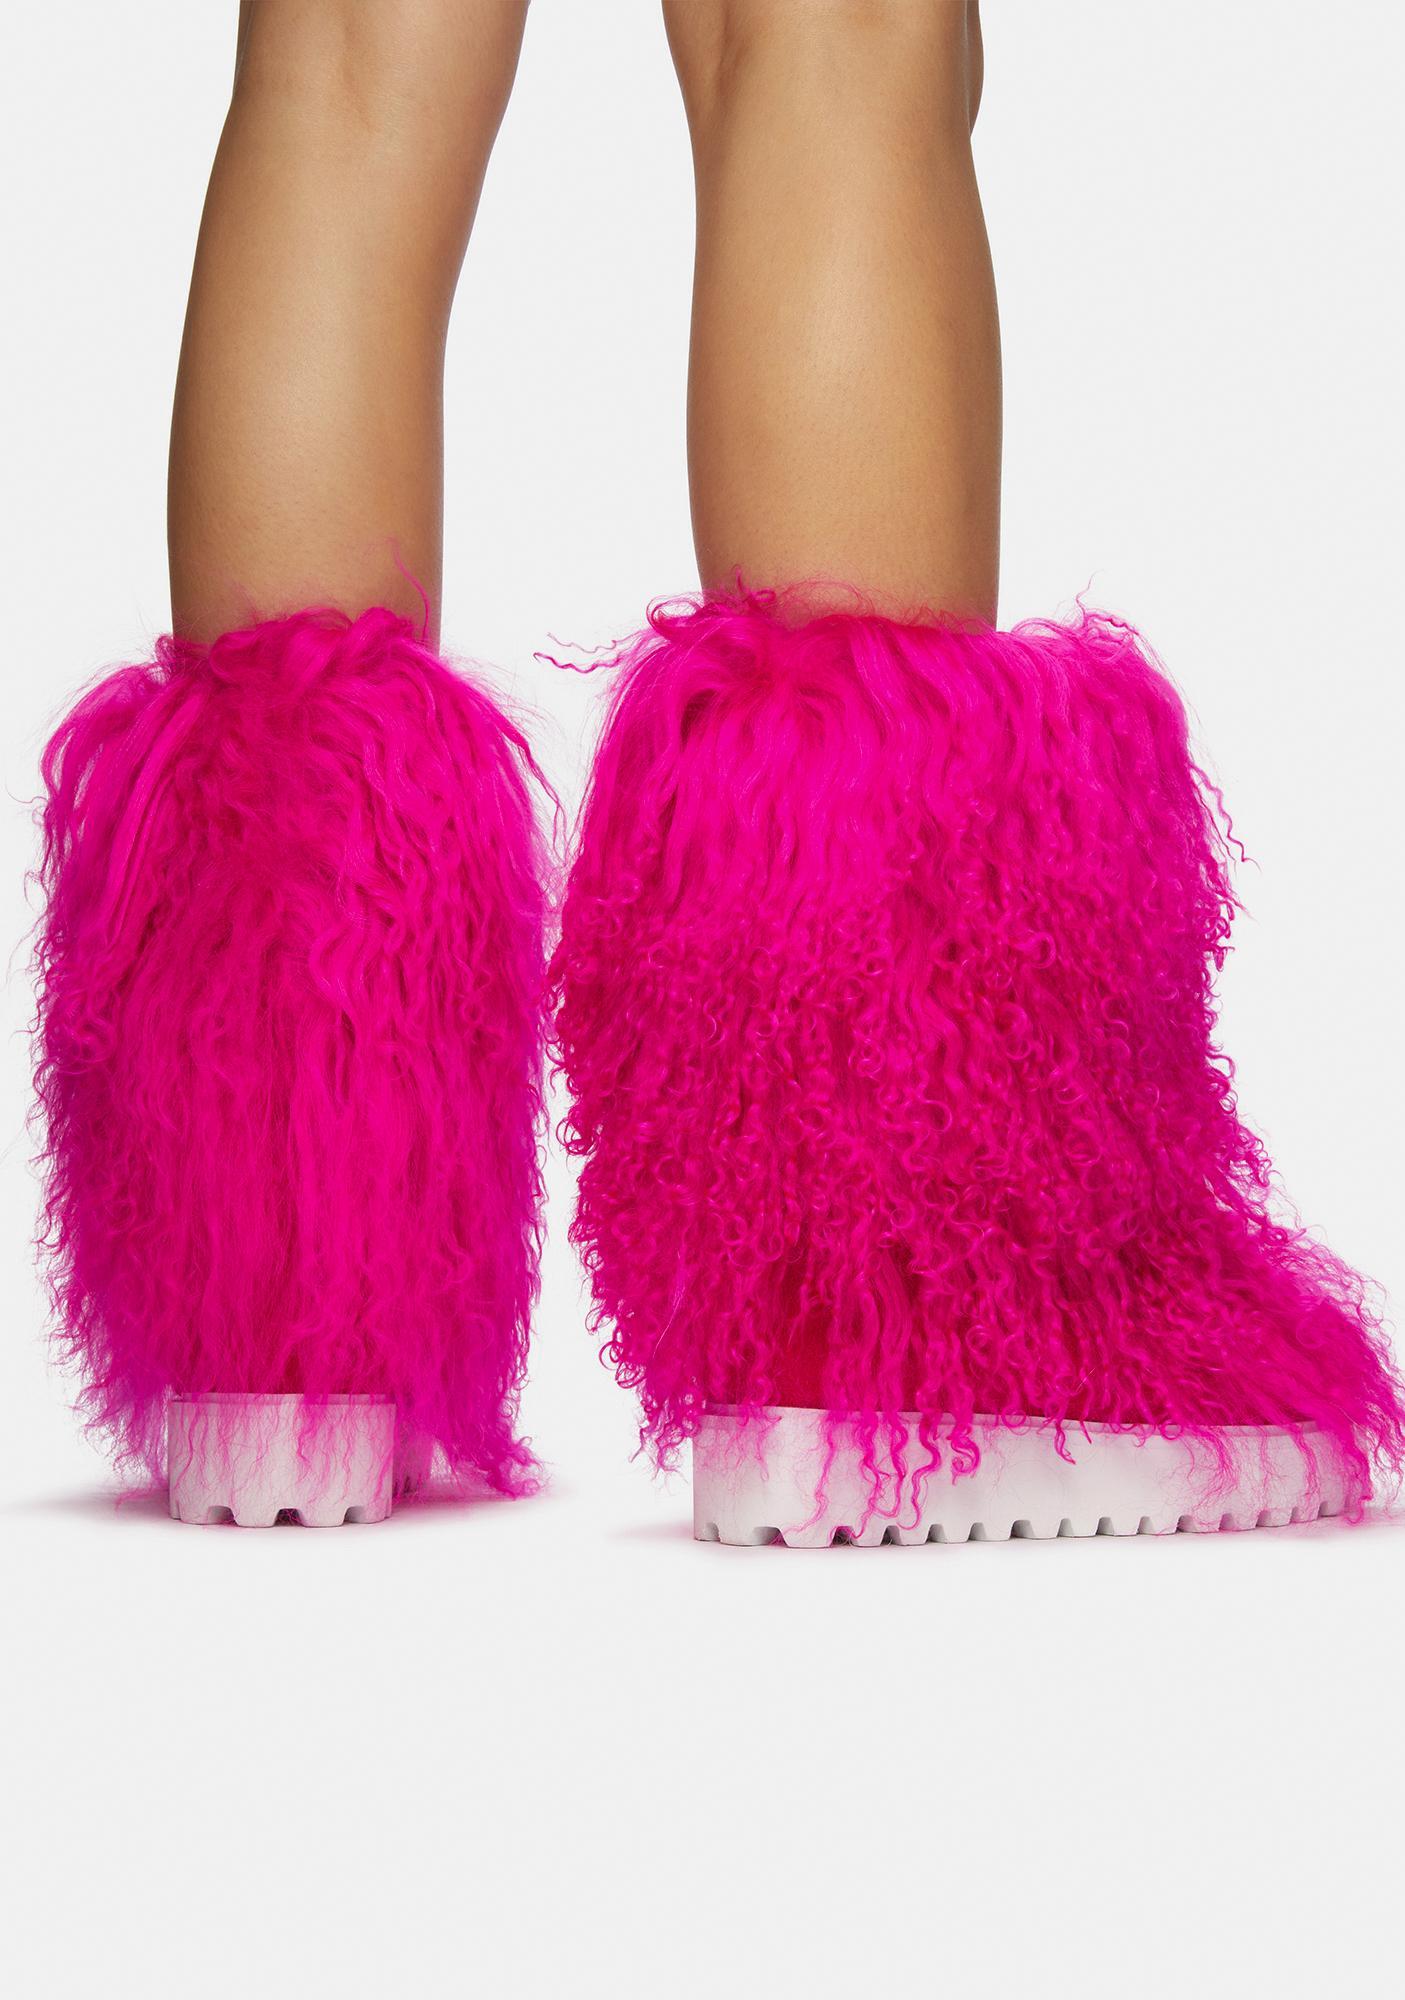 AZALEA WANG Orchid Faux Fur Boots